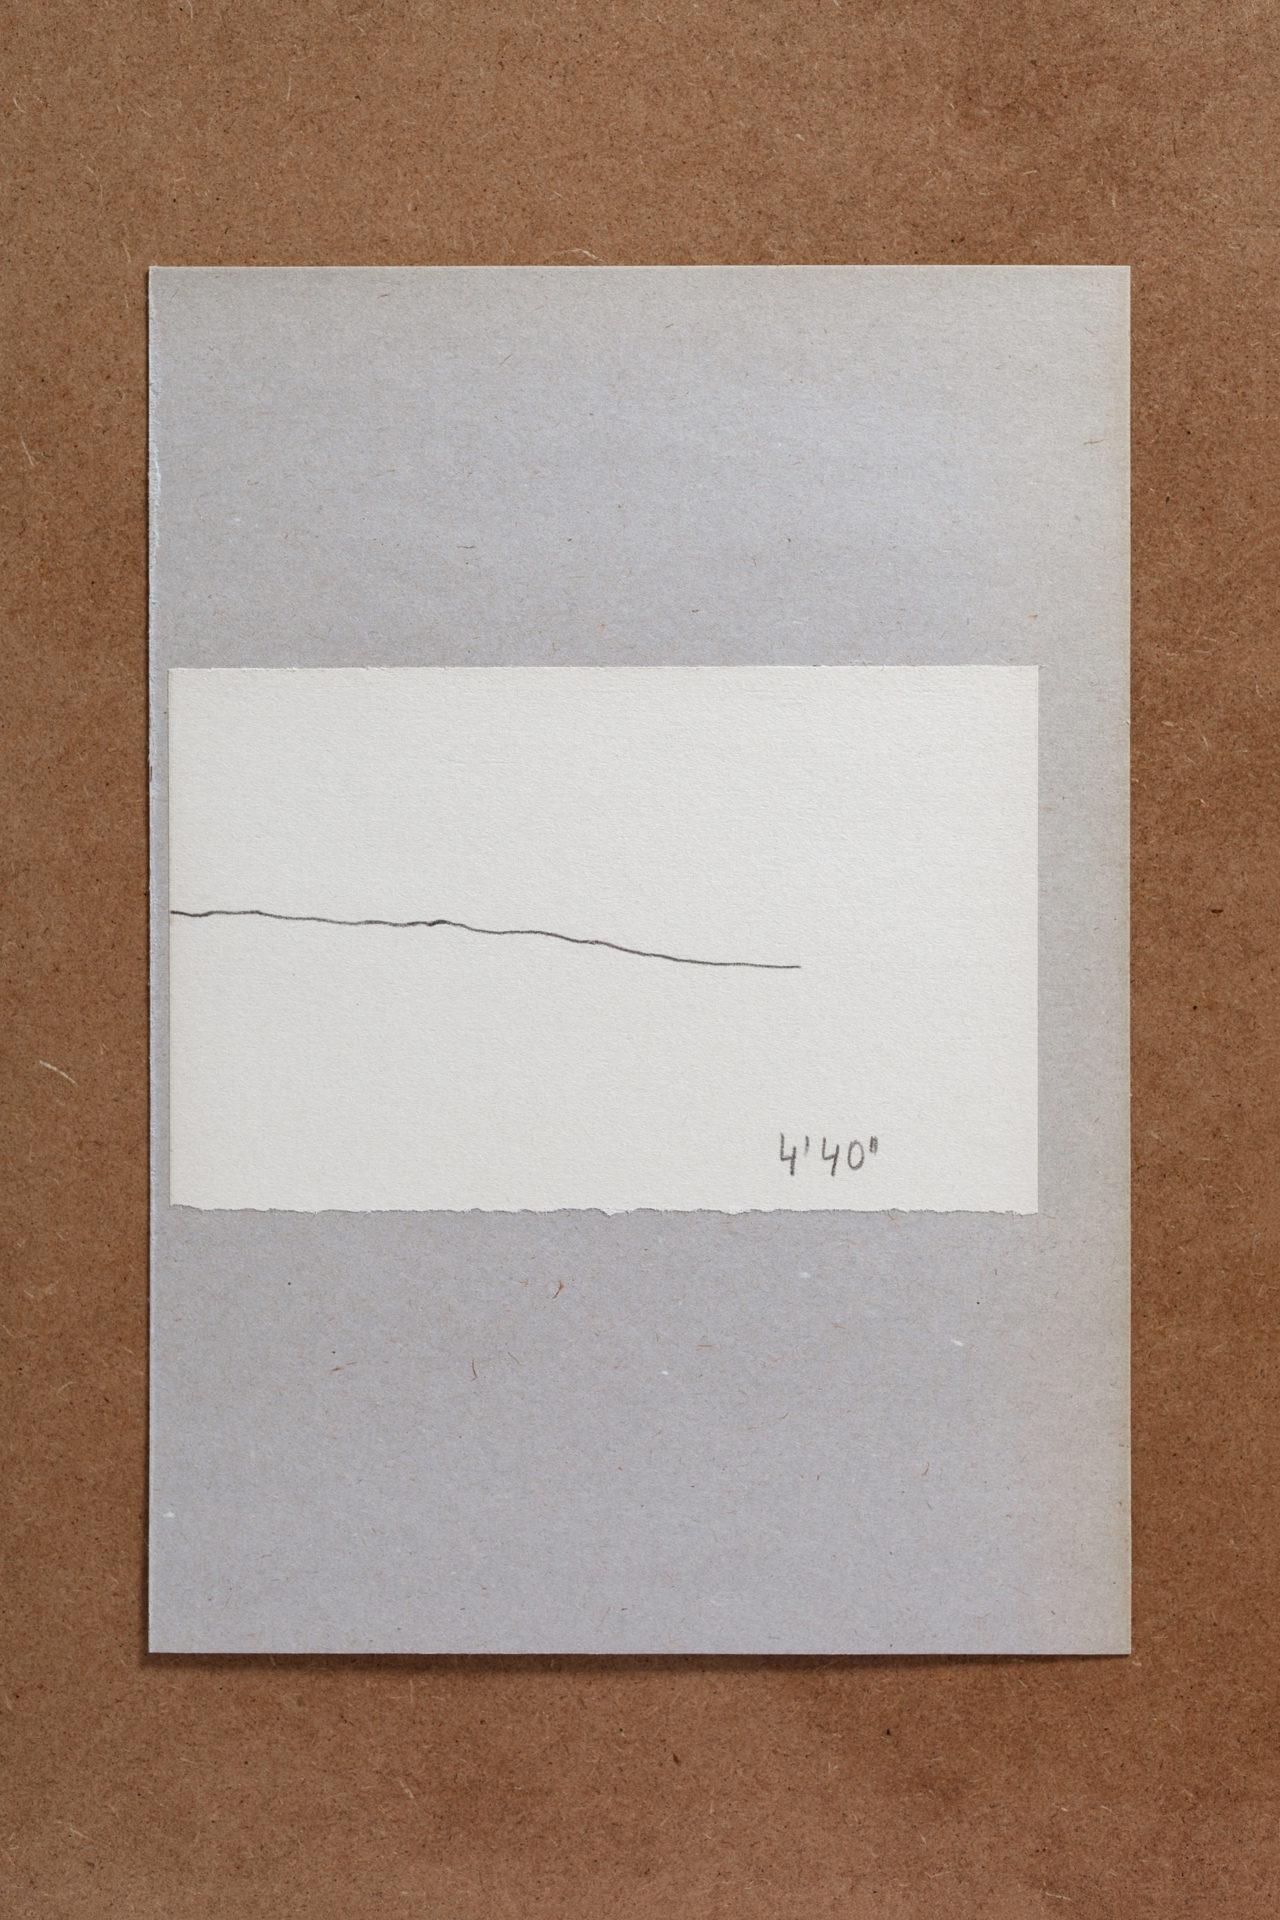 Gabriele Schmidt Heins, 1 Stunde, subjektiv / objektiv (Auszug) (1976)